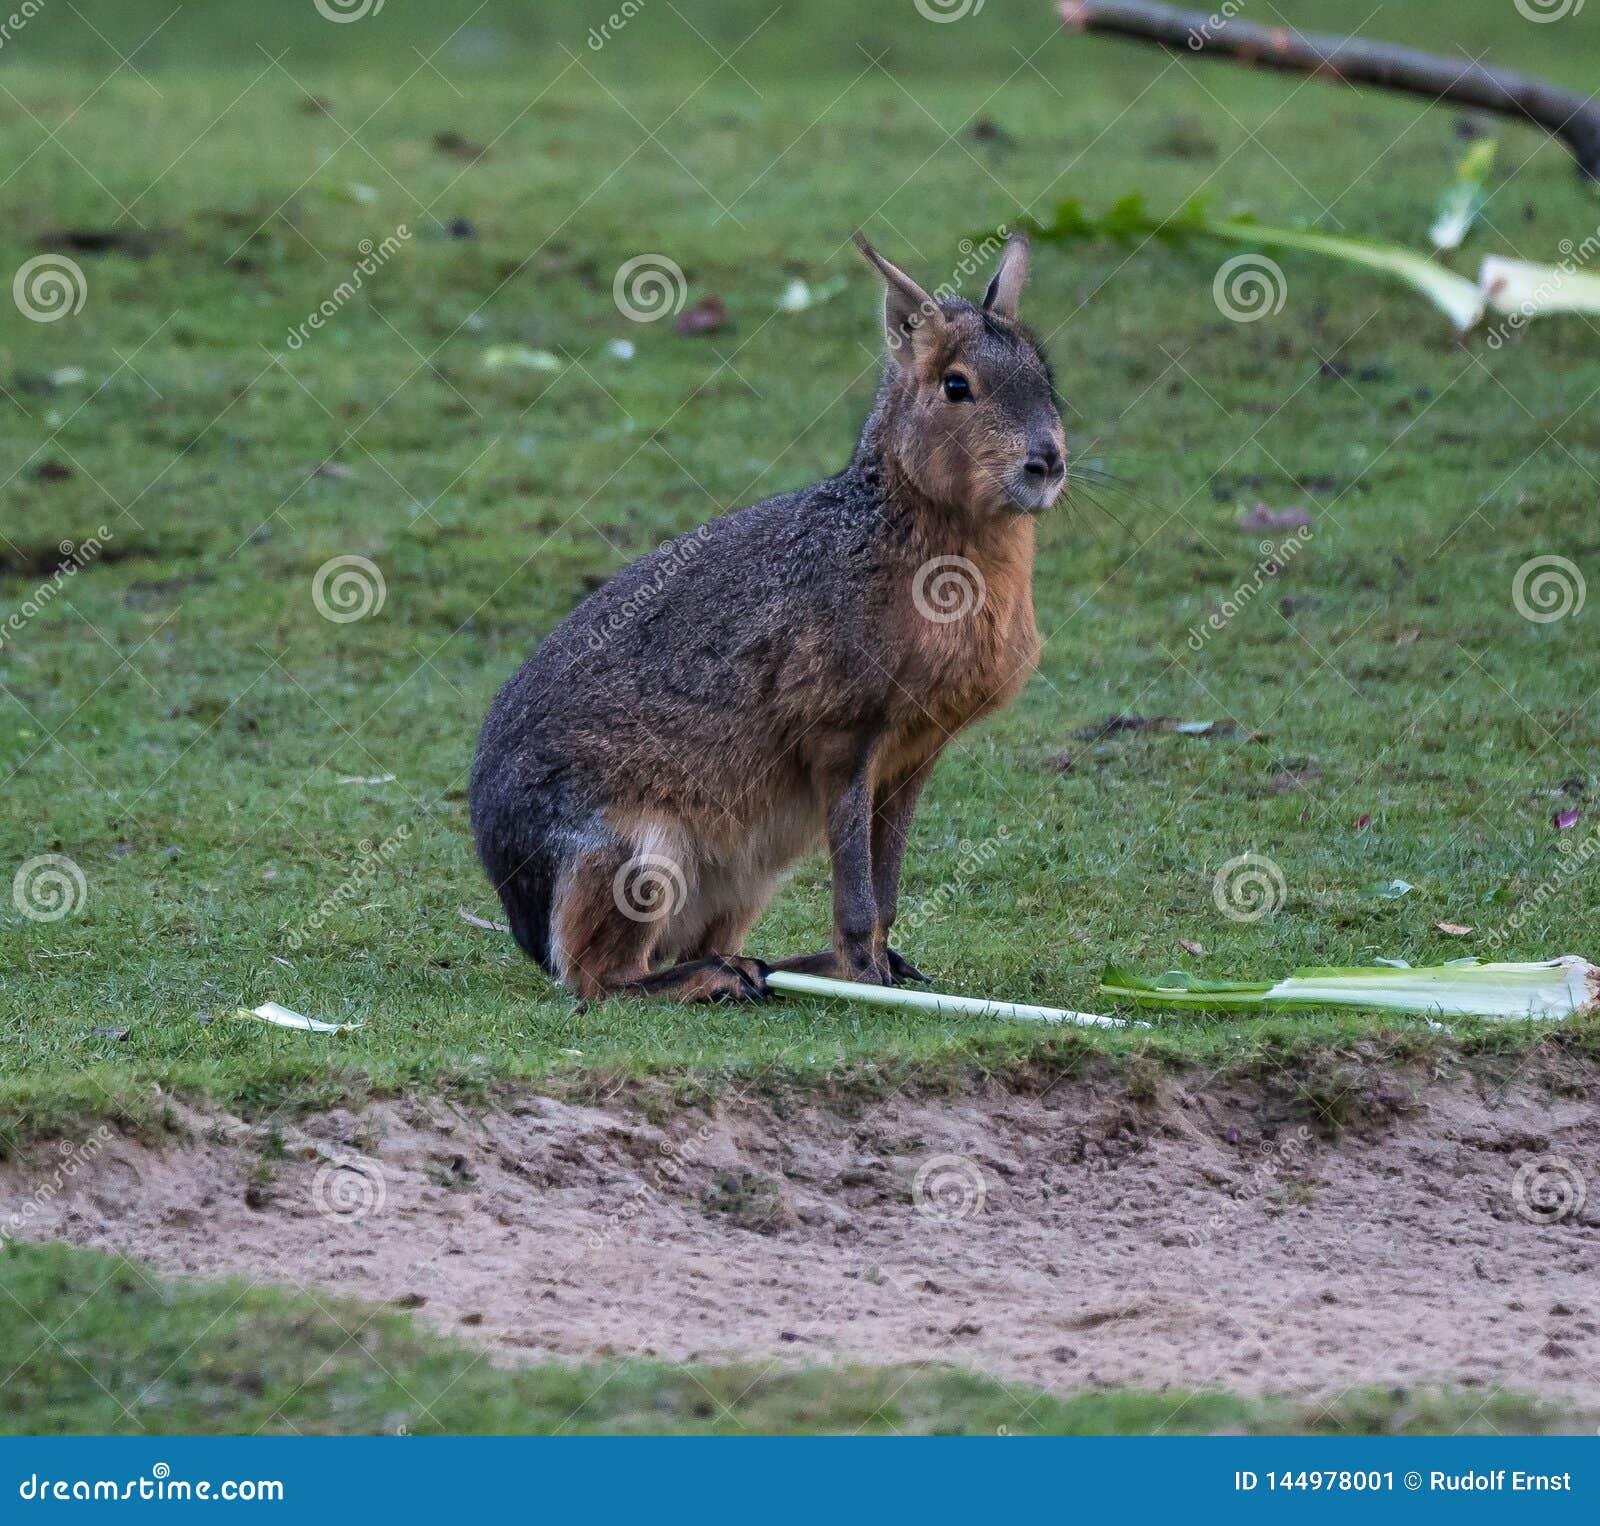 Patagonian Mara, Dolichotis patagonum are large relatives of guinea pigs